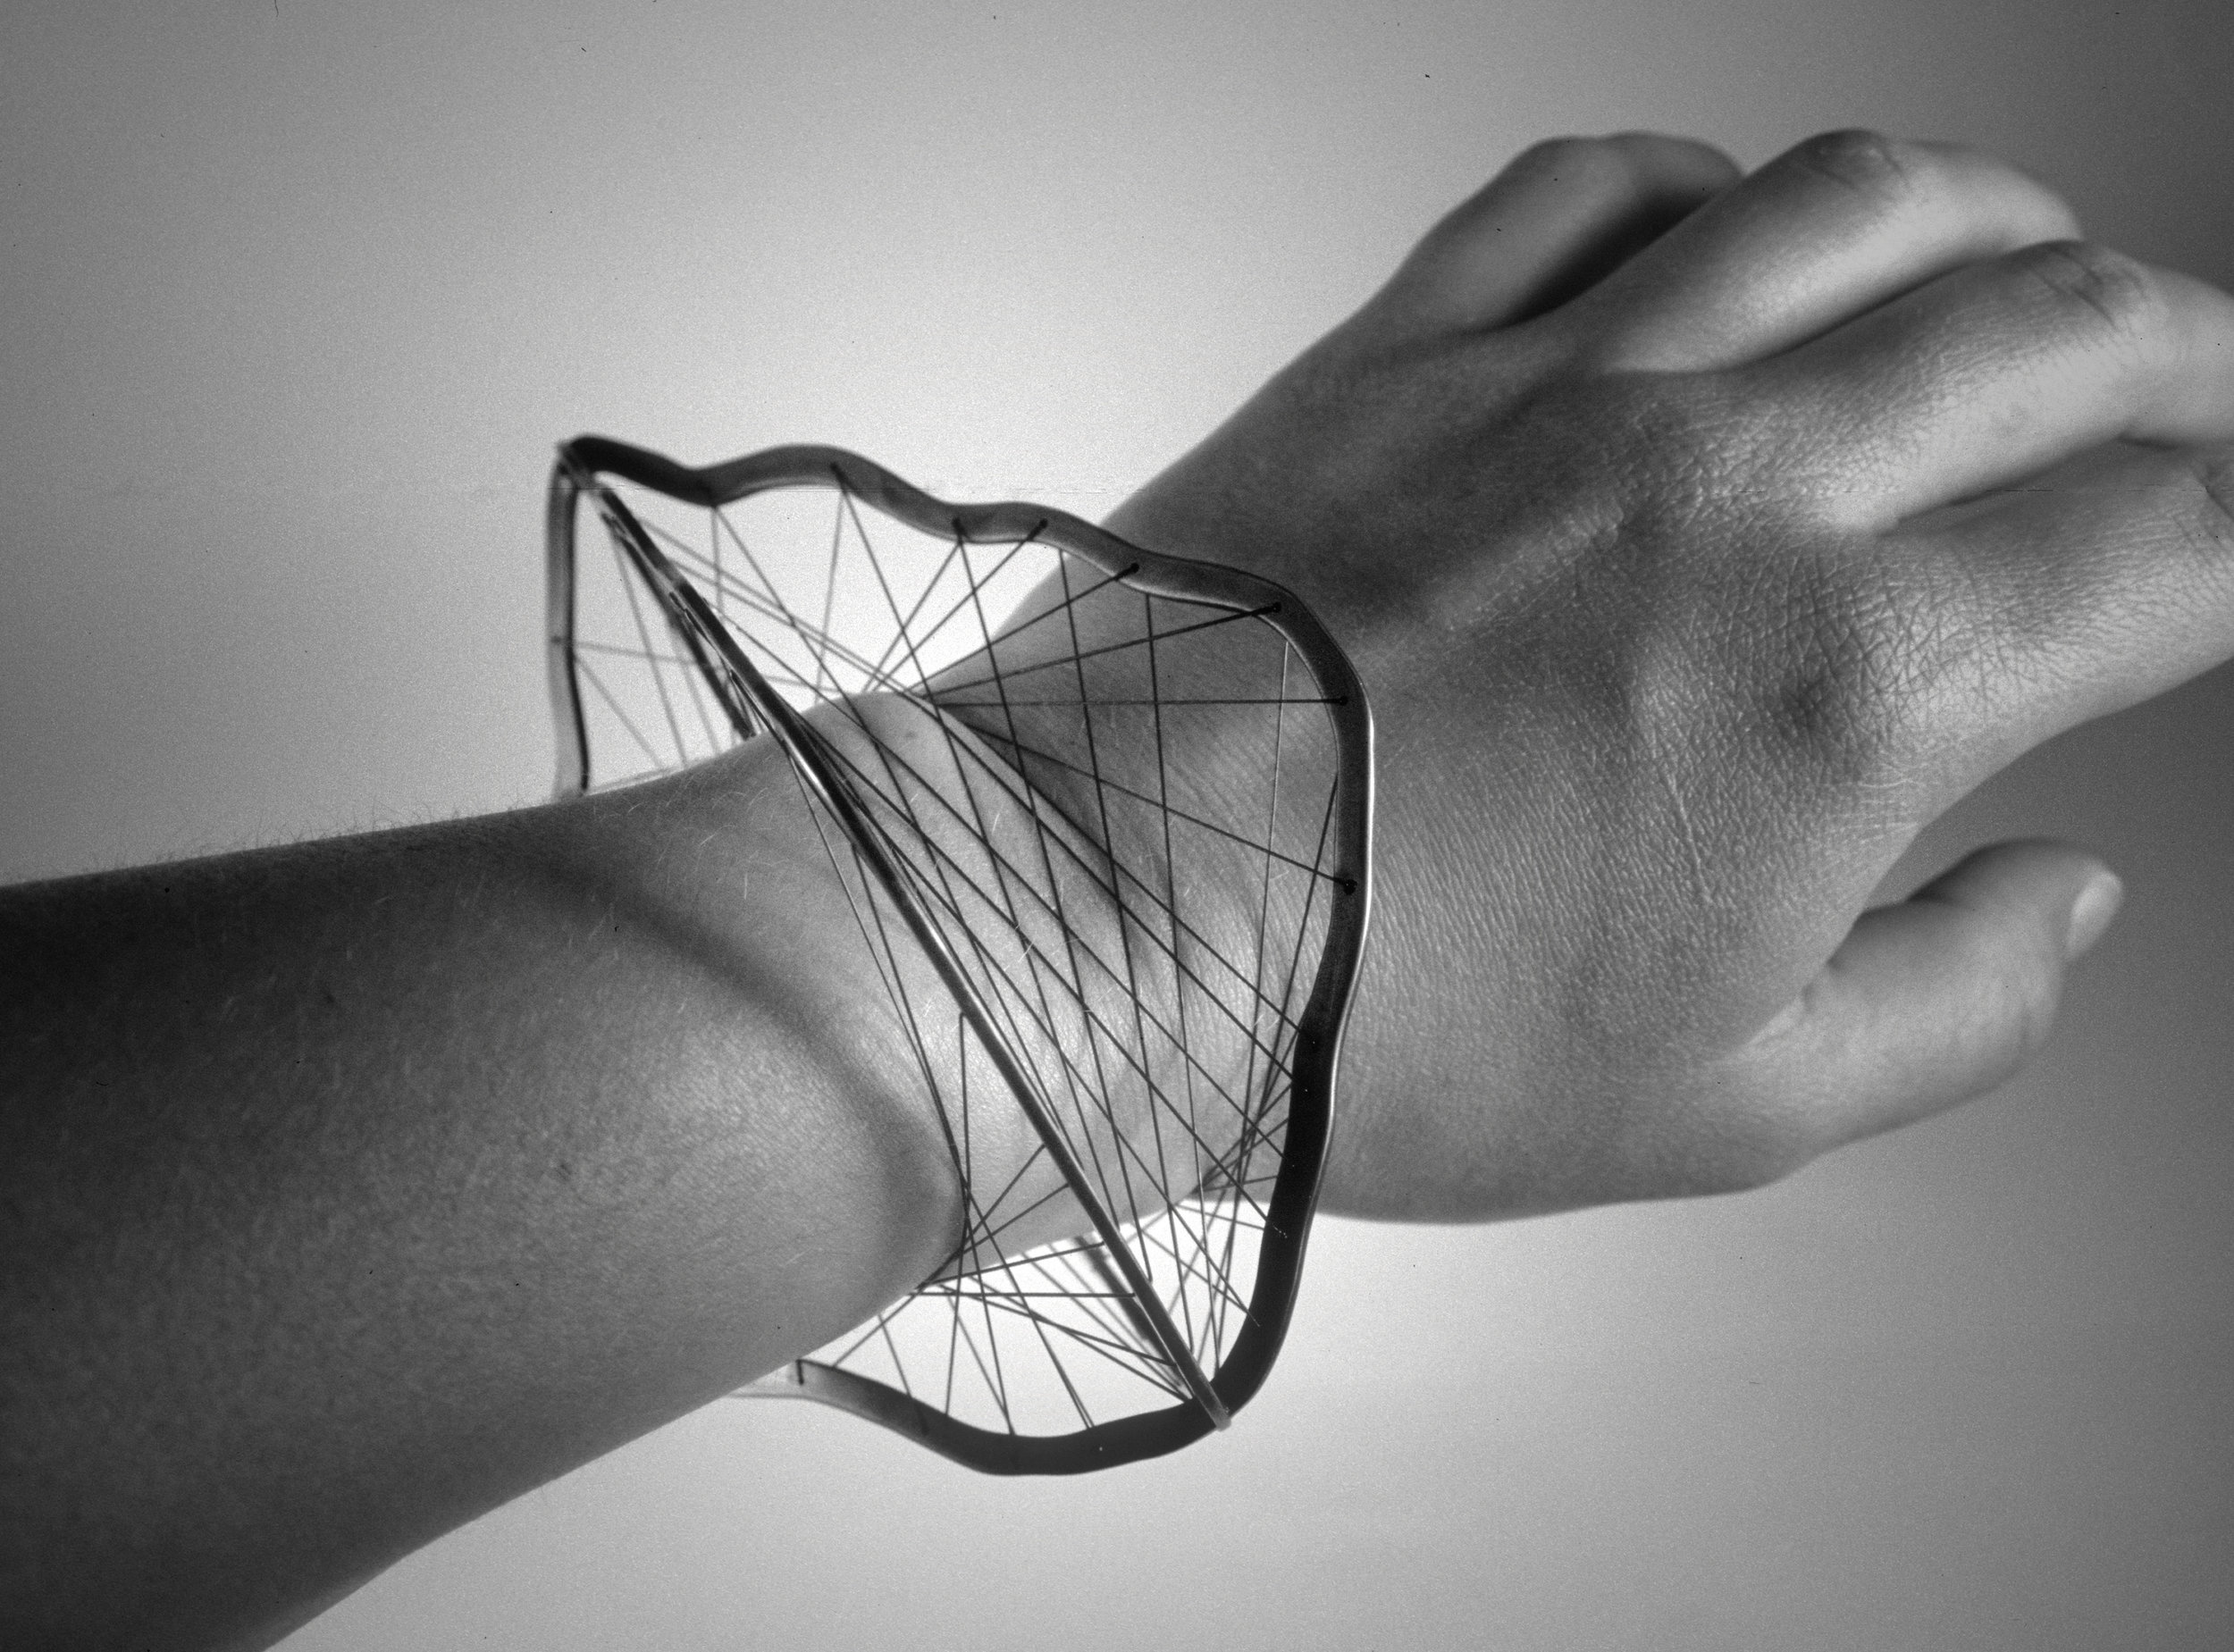 Wrist Expansion 2 - 2006